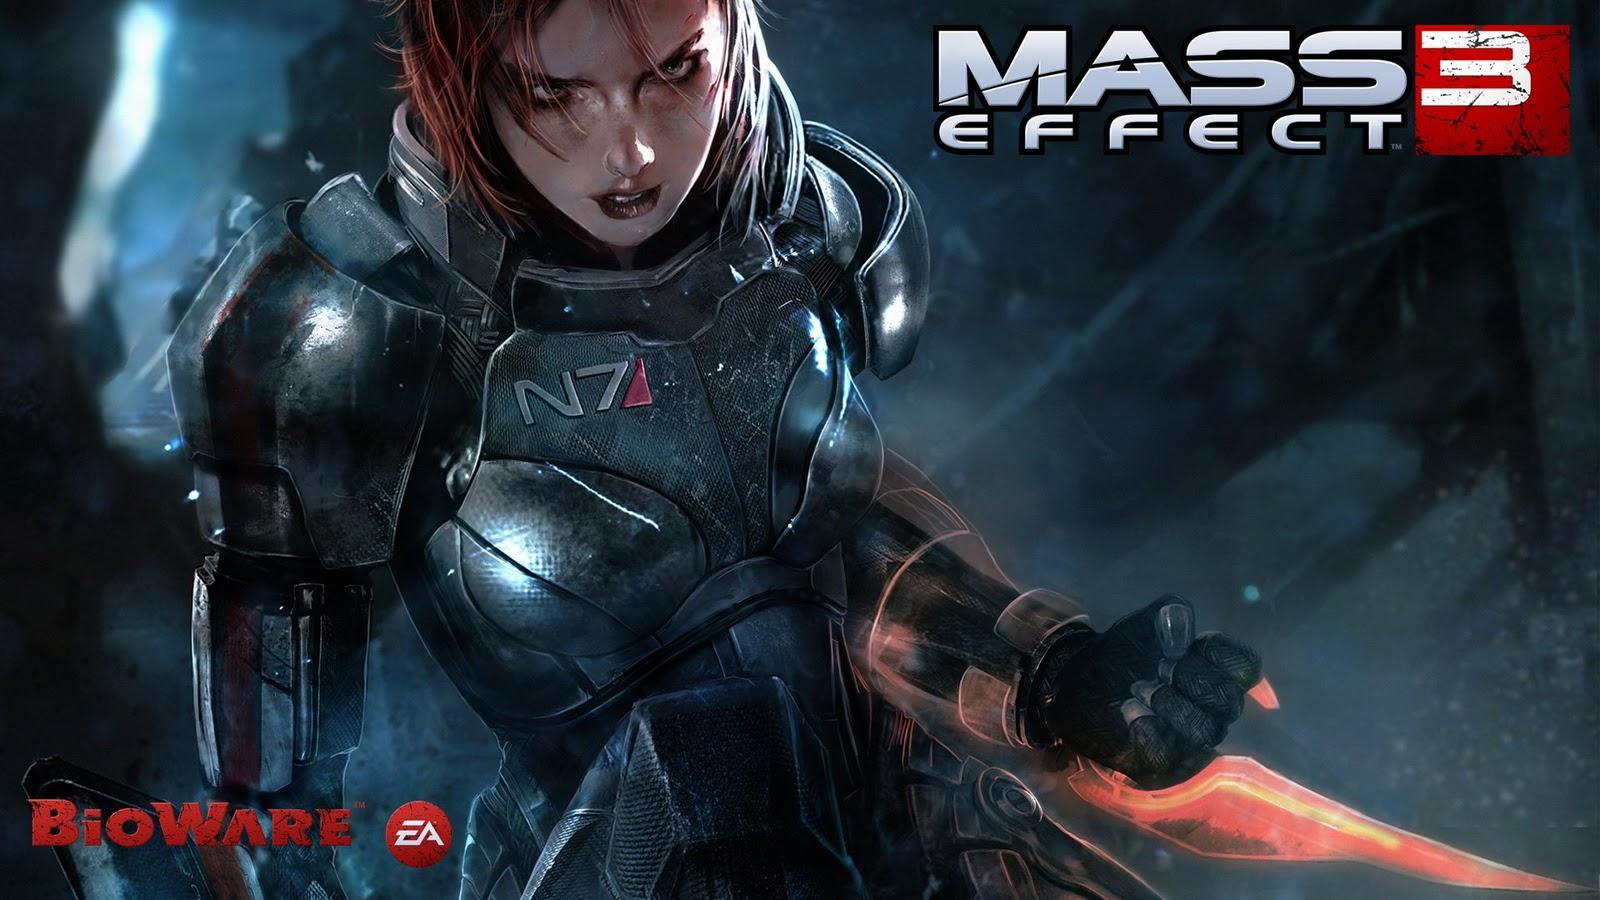 Eyesurfing: Mass Effect 3 Wallpaper 壁紙